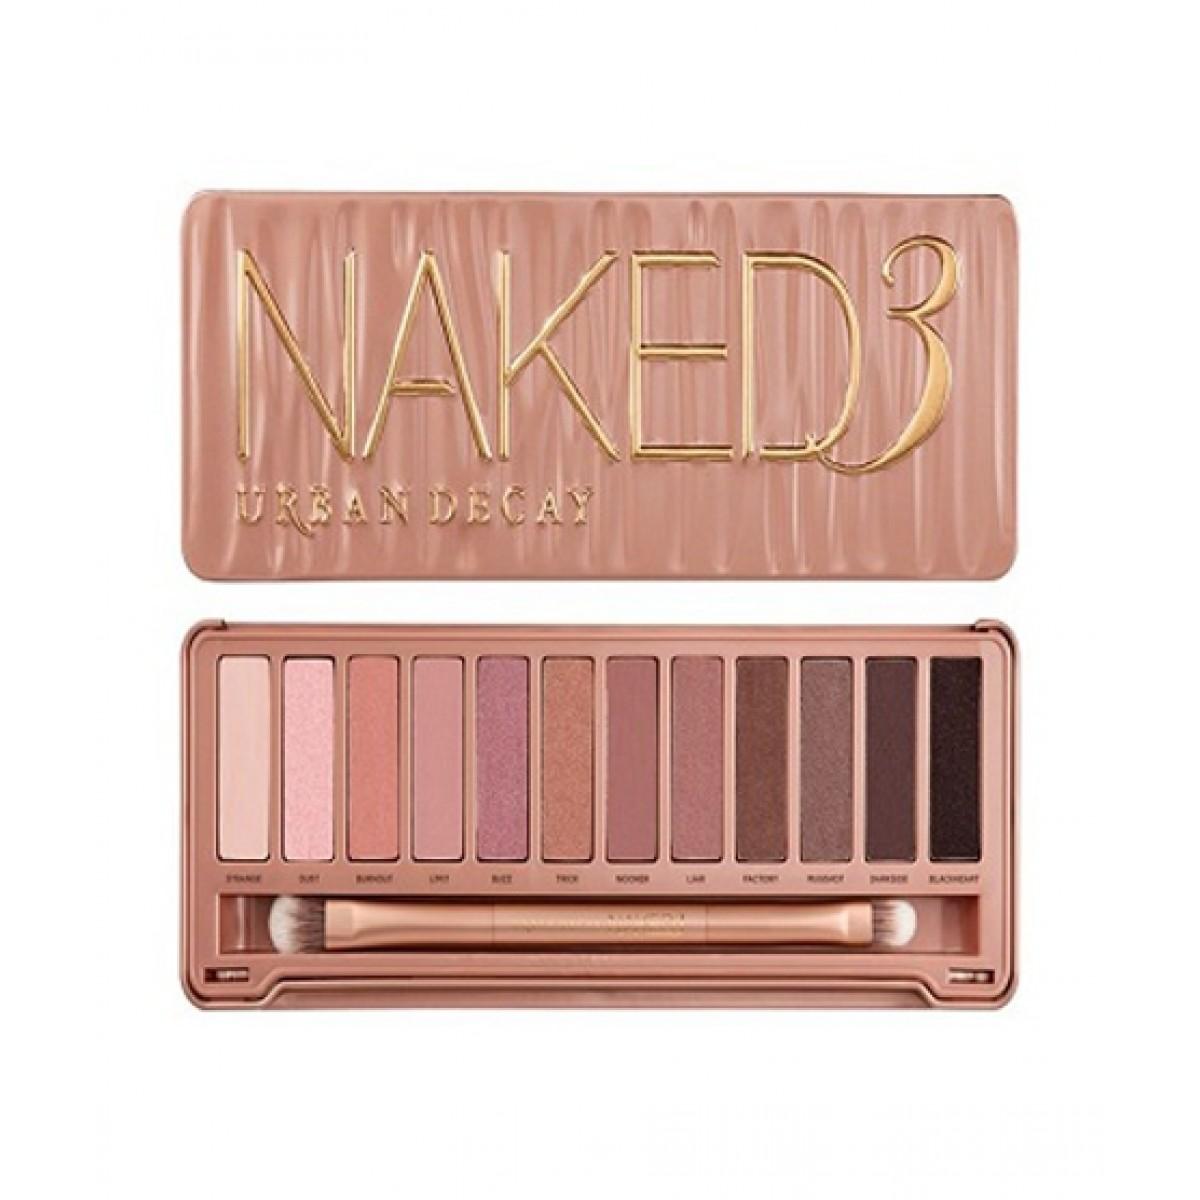 naked eyes palette prisjakt